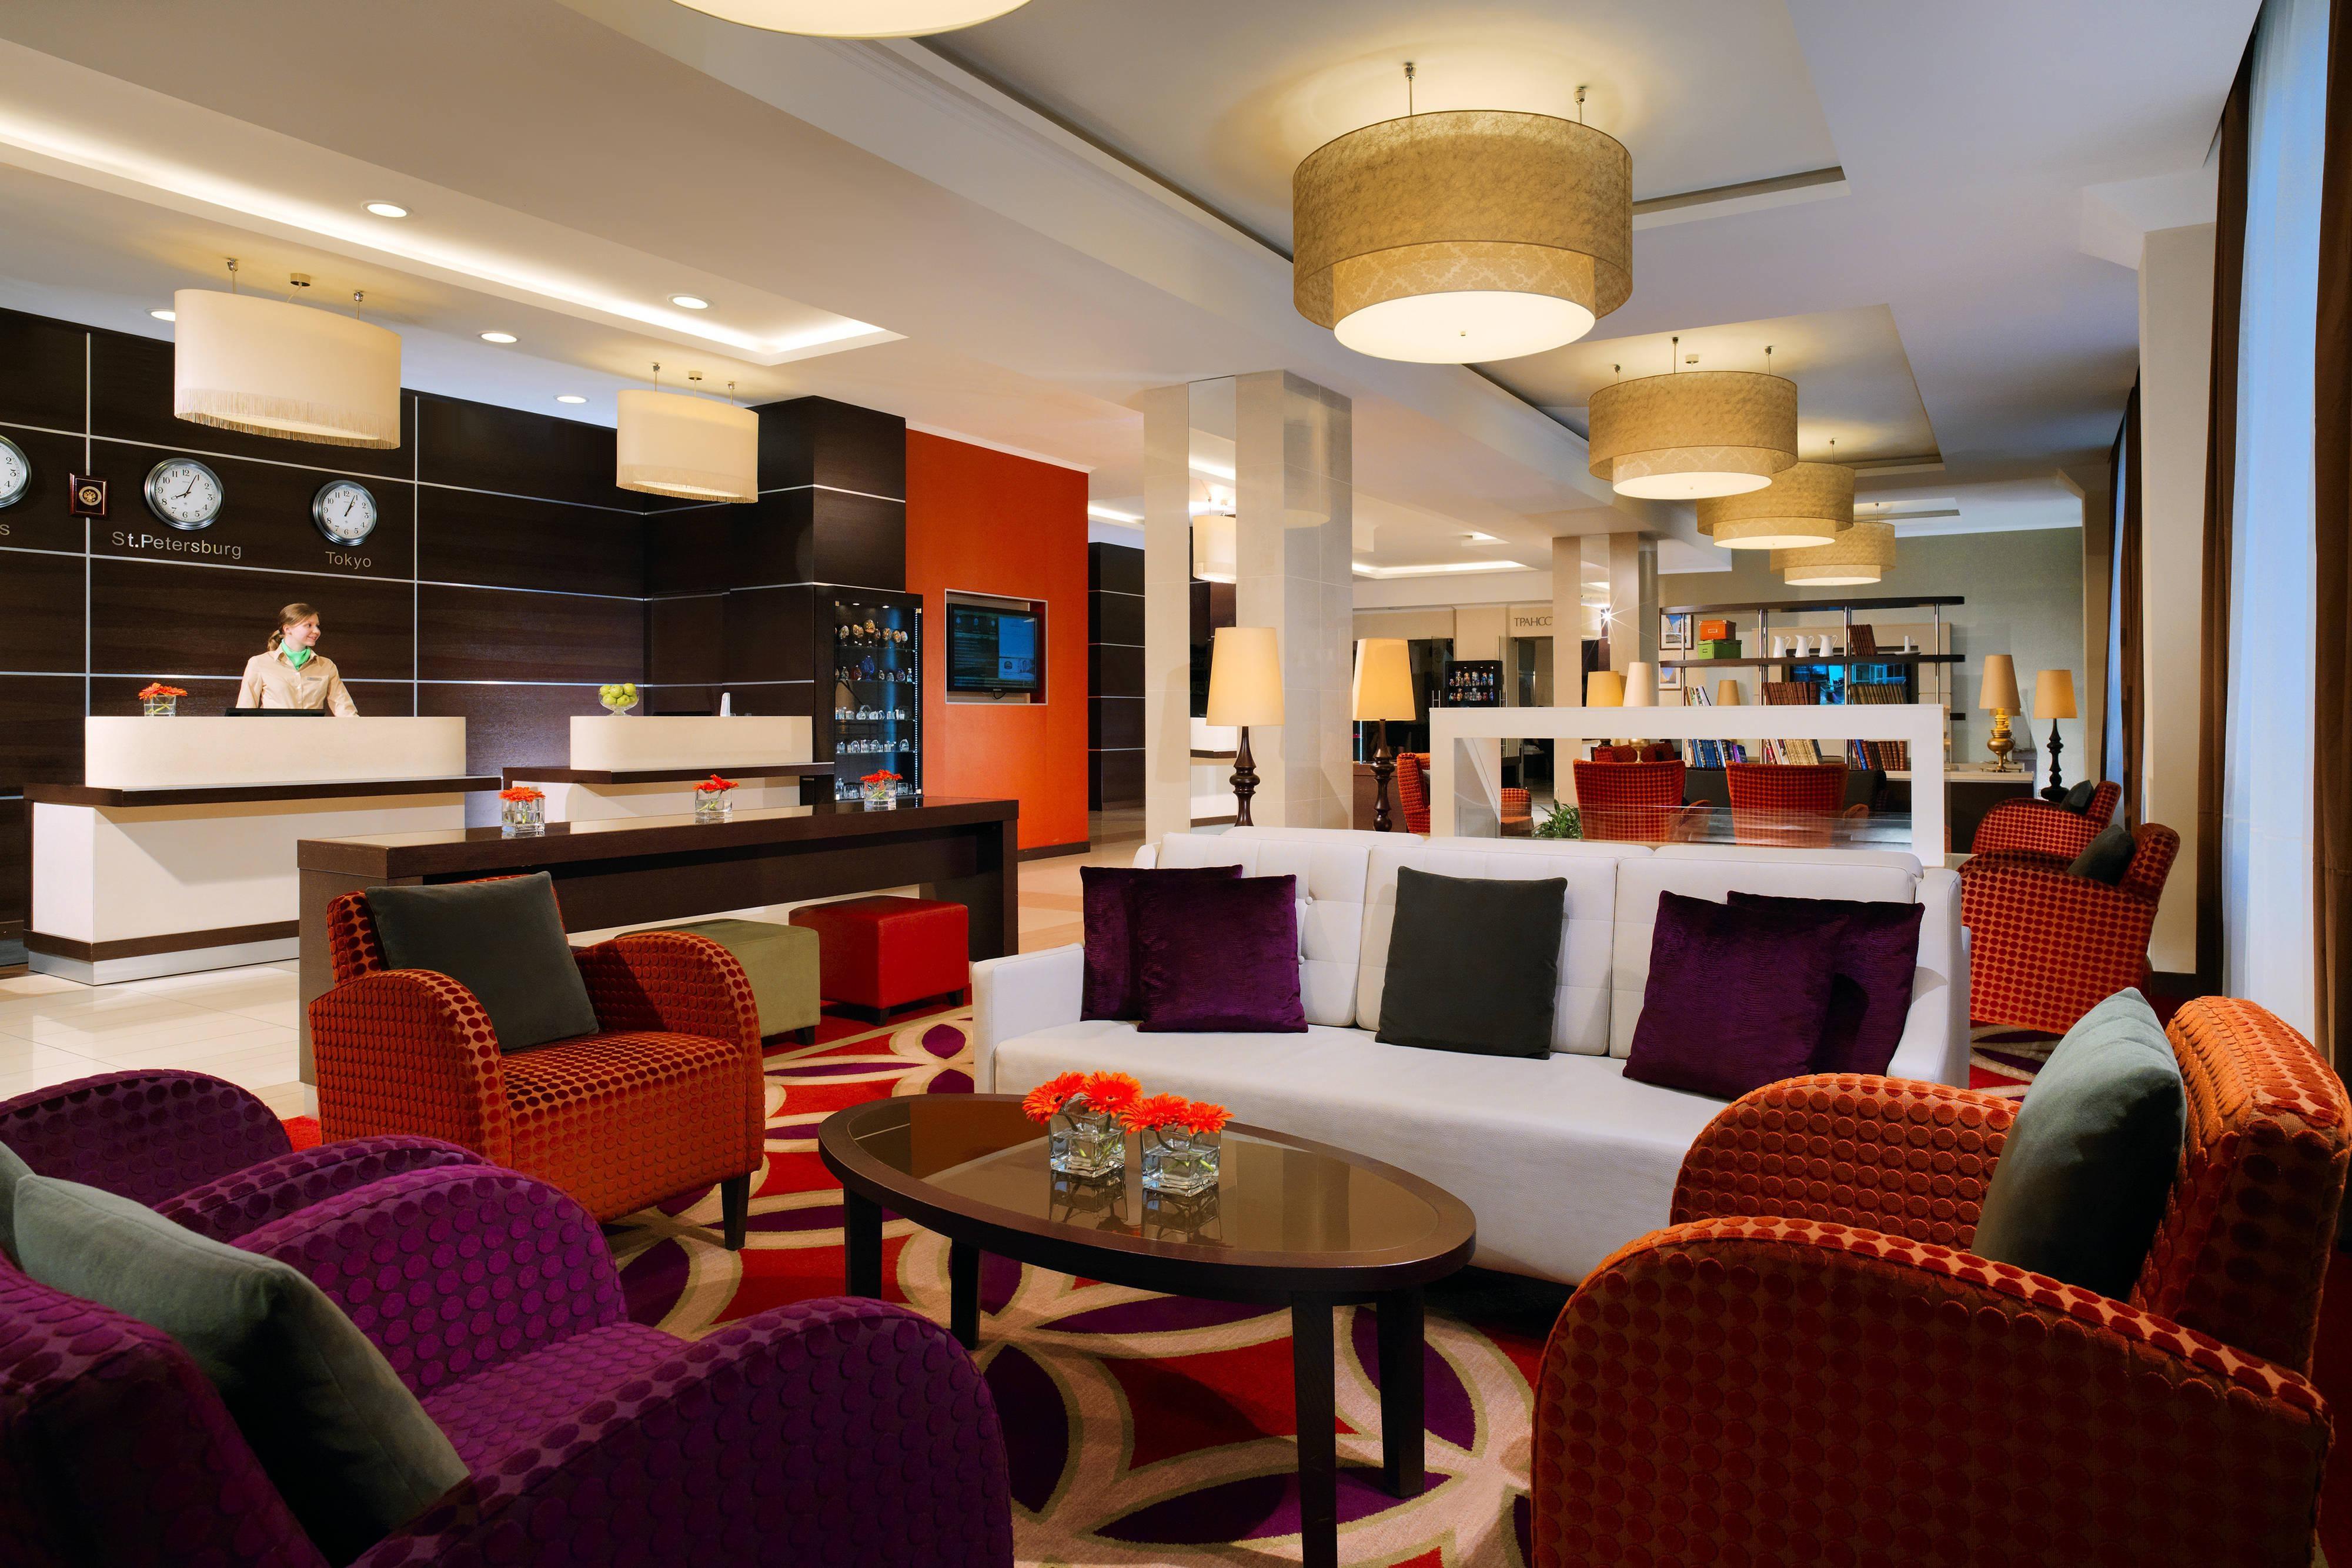 St. Petersburg Russia Hotel Lobby